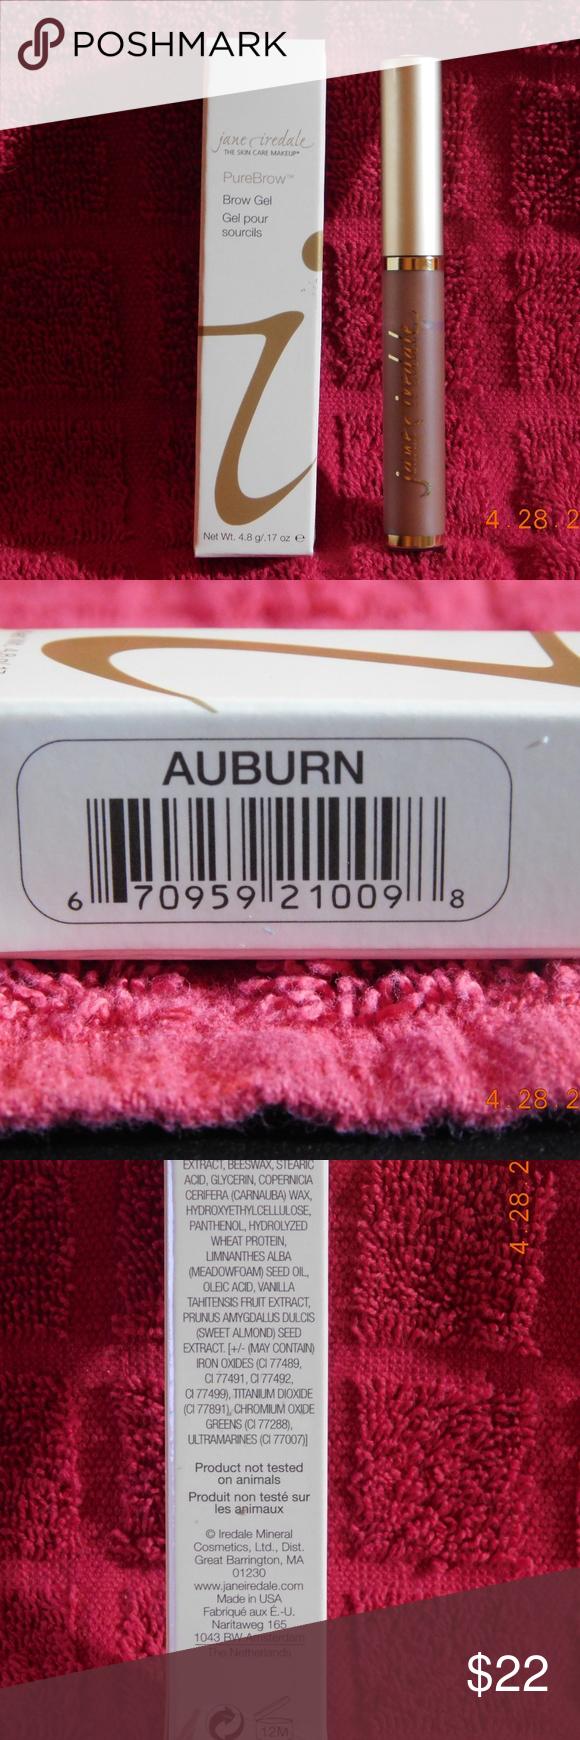 Jane Iredale PureBrow Brow Gel Auburn PureBrow Brow Gel